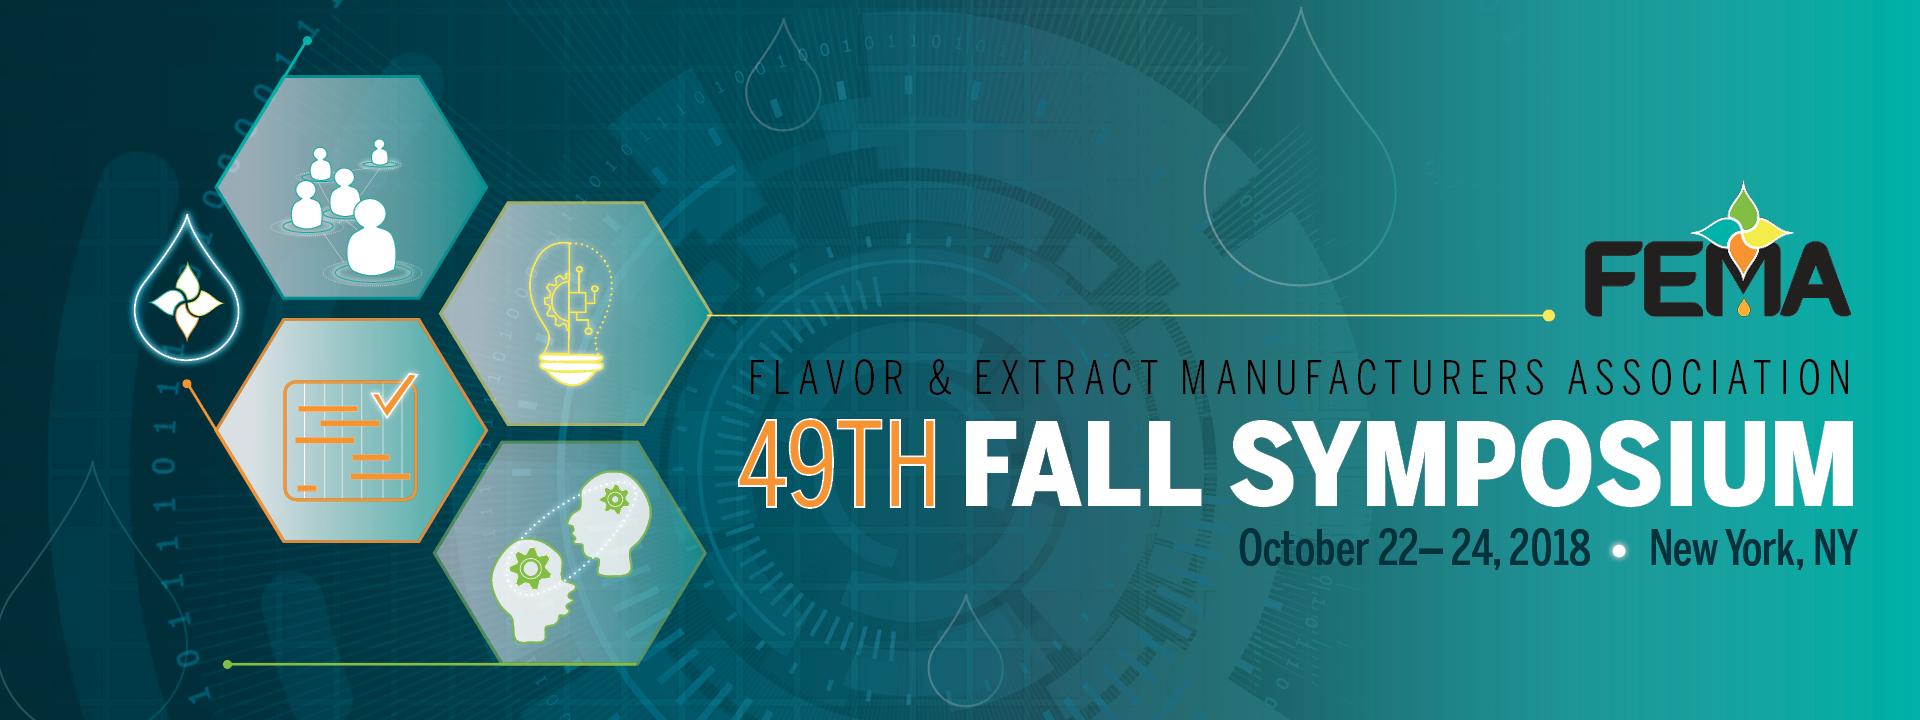 49th Fall Symposium hero revised